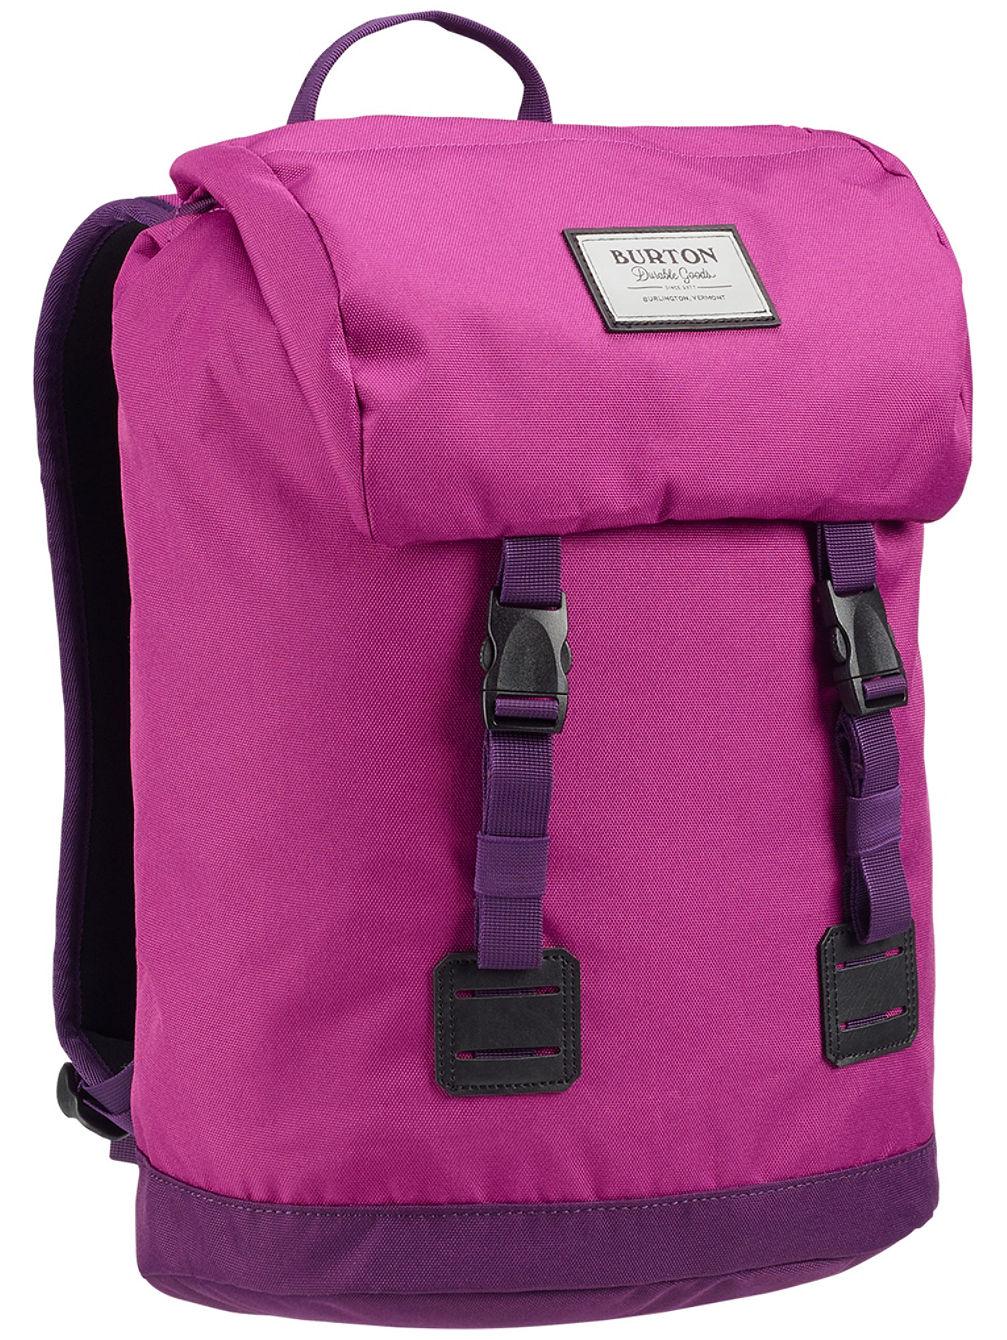 2fbf9678f03f12 Buy Burton Tinder Backpack online at Blue Tomato